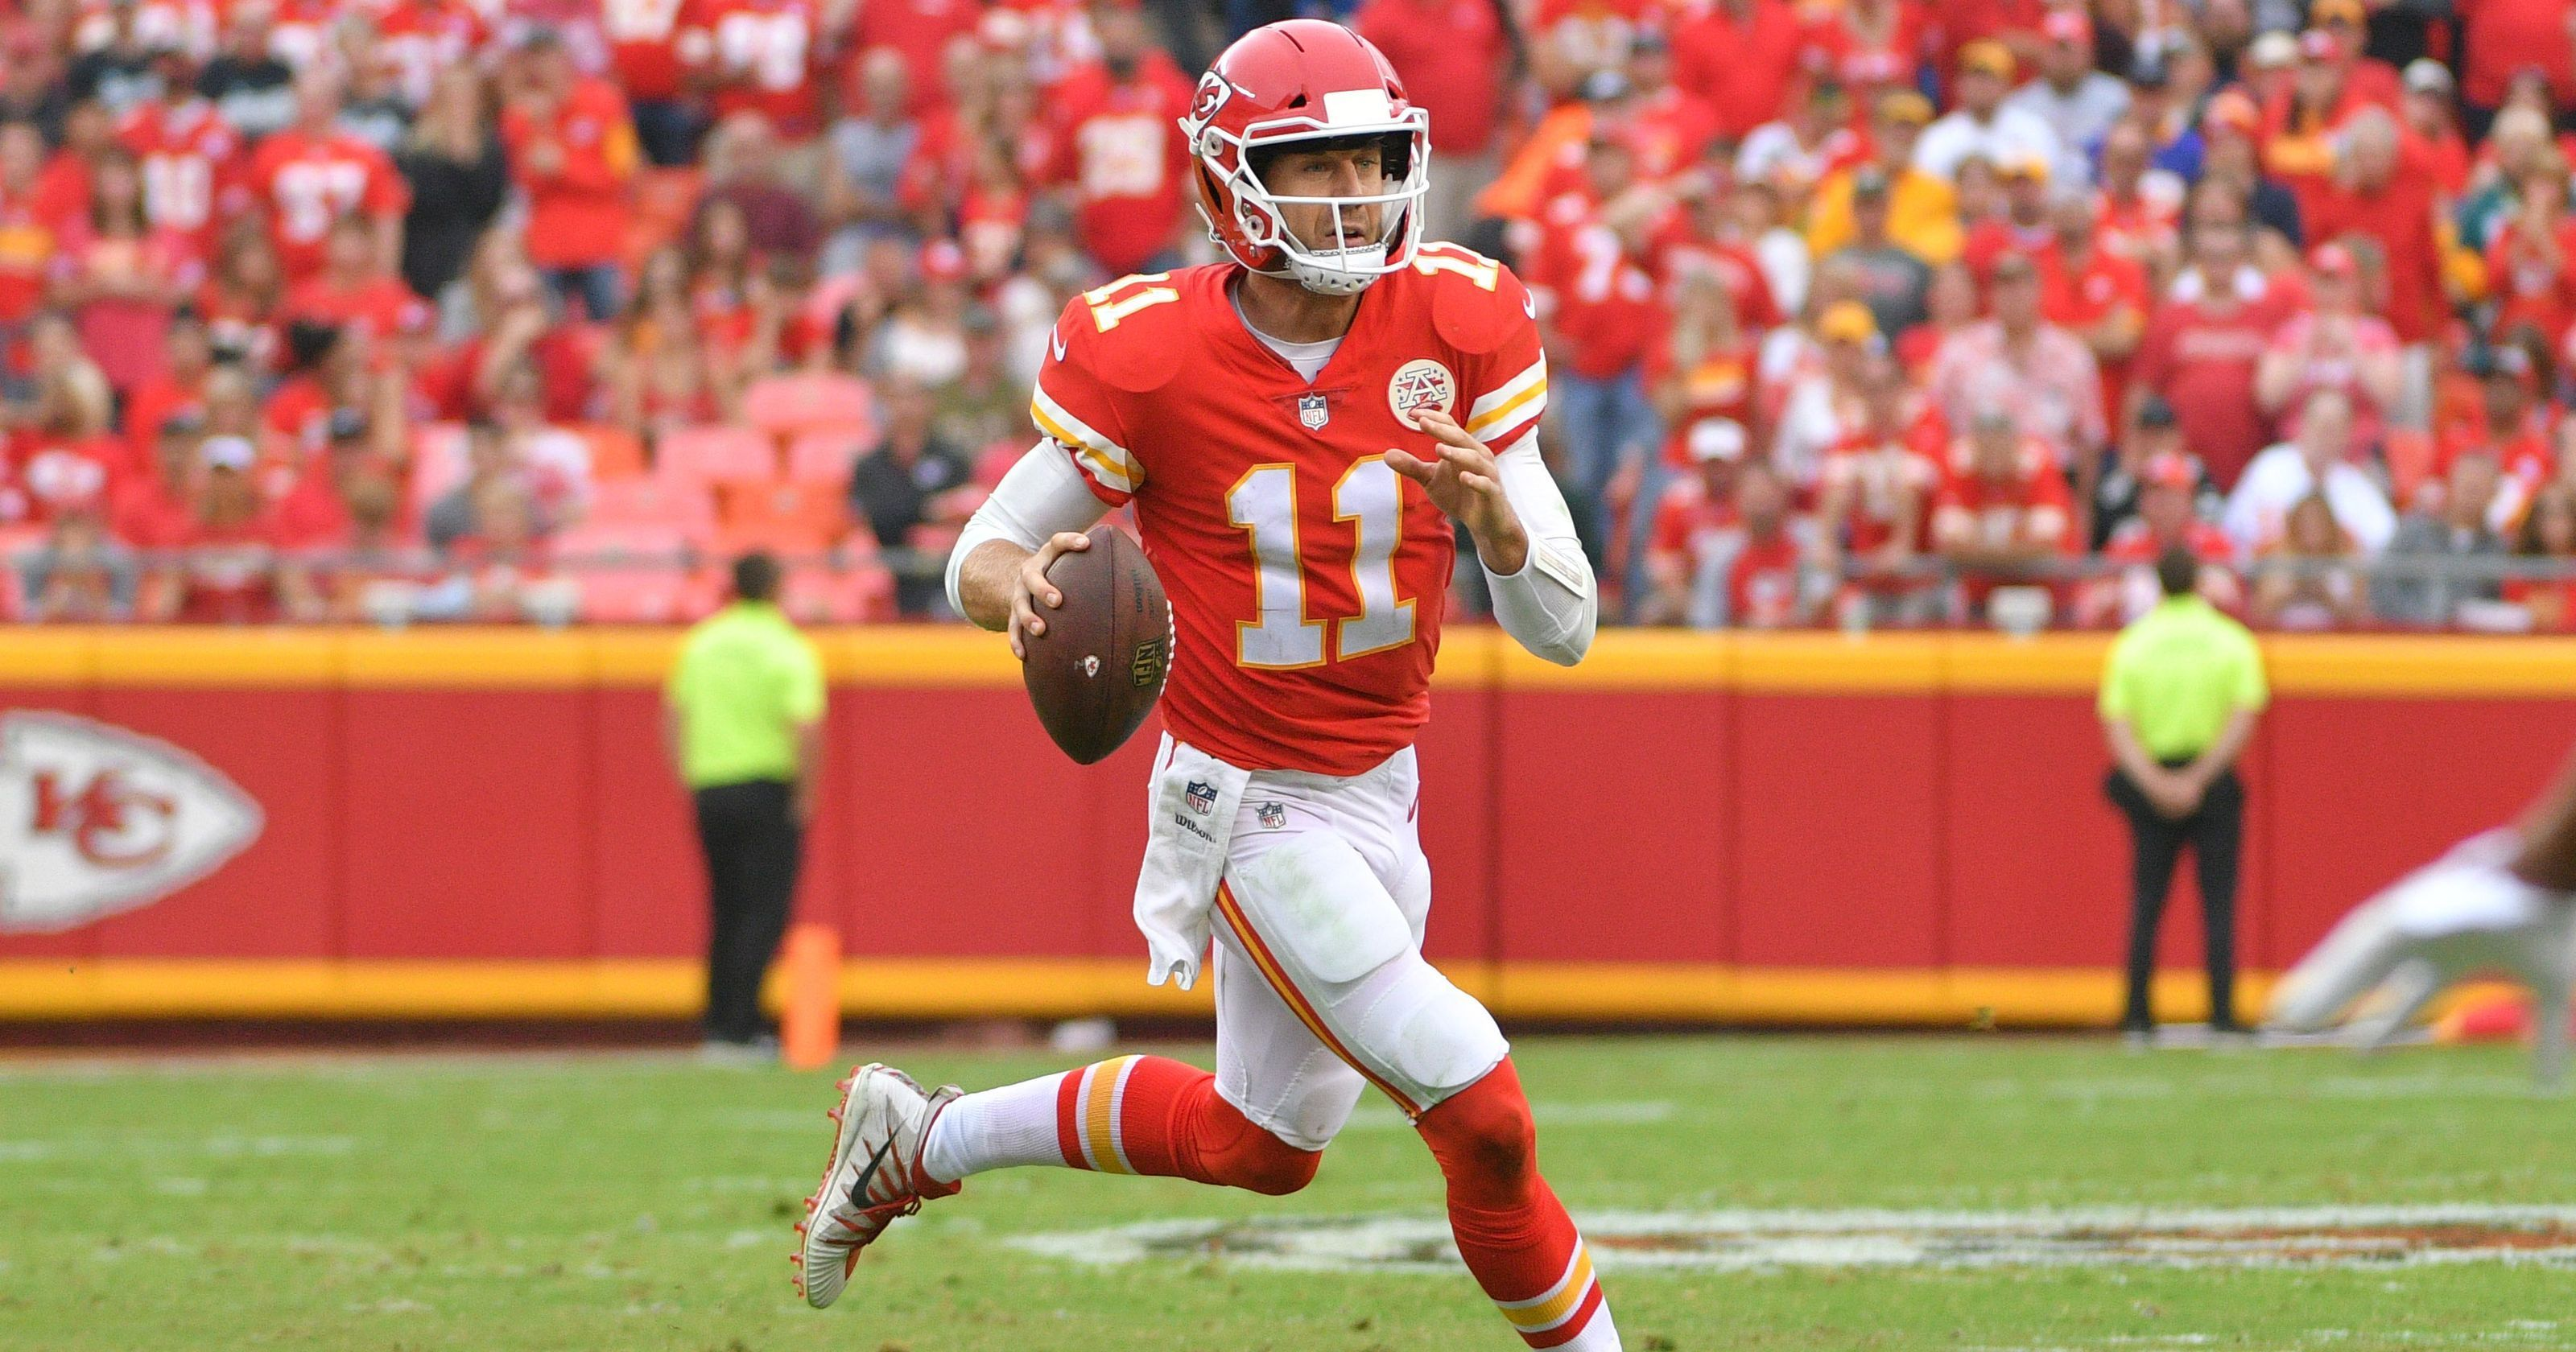 NFL MVP tracker: Kansas City Chiefs QB Alex Smith remains in lead